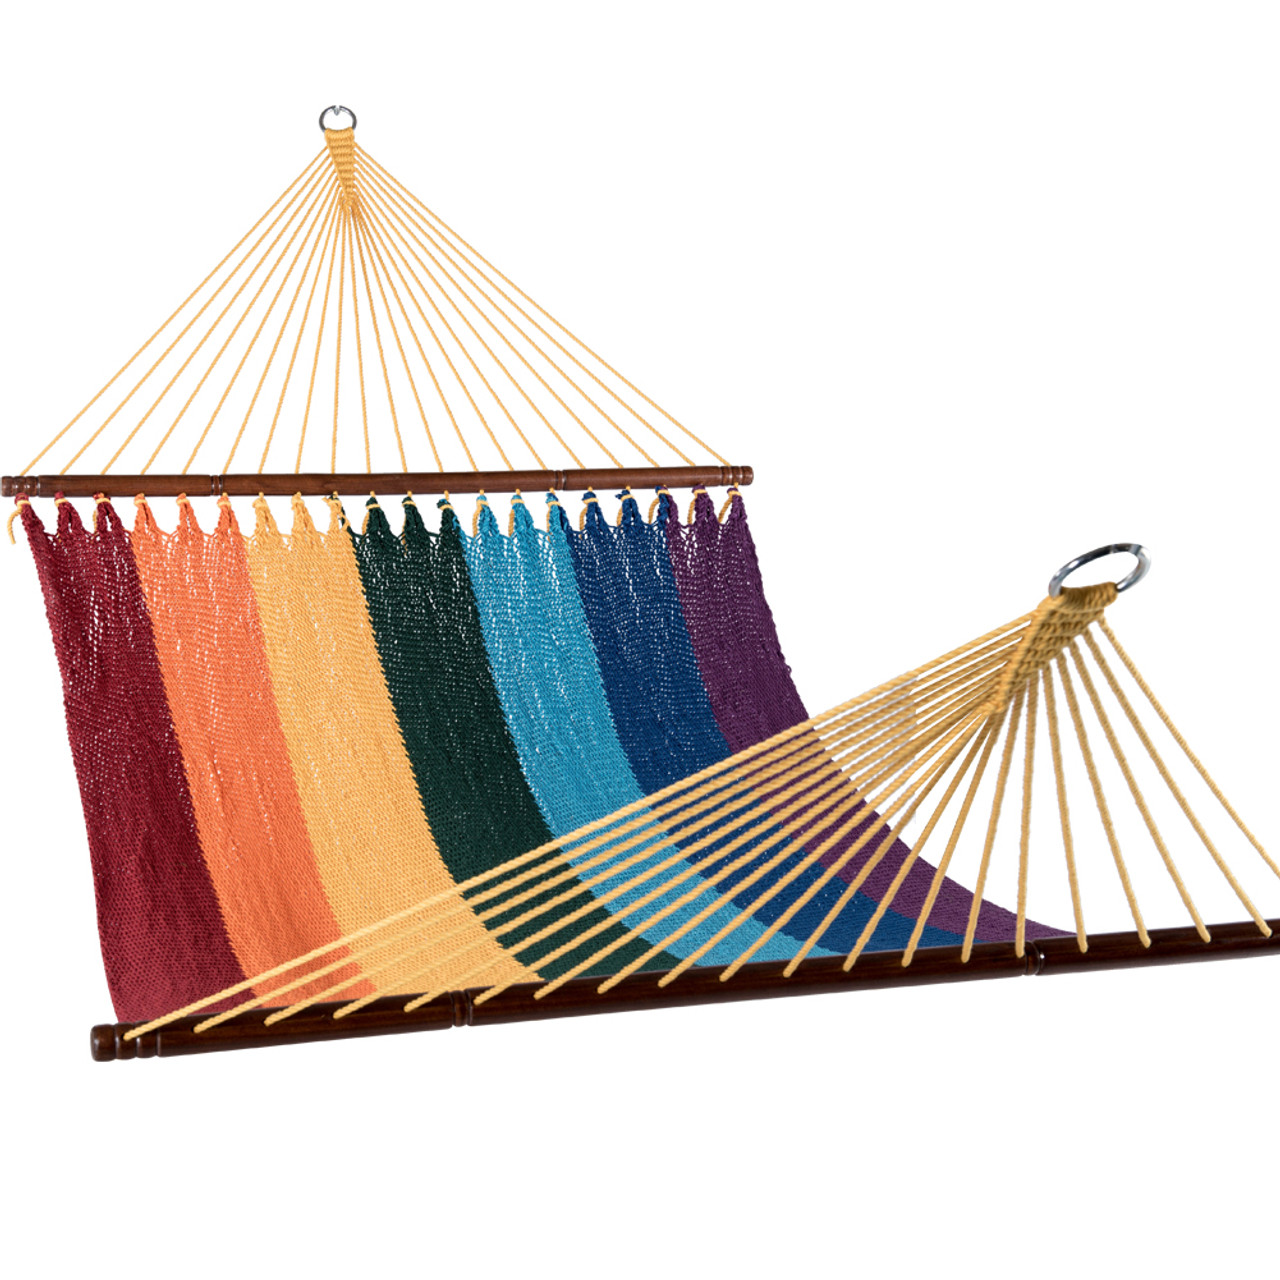 inch lazy caribbean swing blue daze woven sky double hammocks outdoor patio dsc bed rope handmade hand polyester sundale hammock